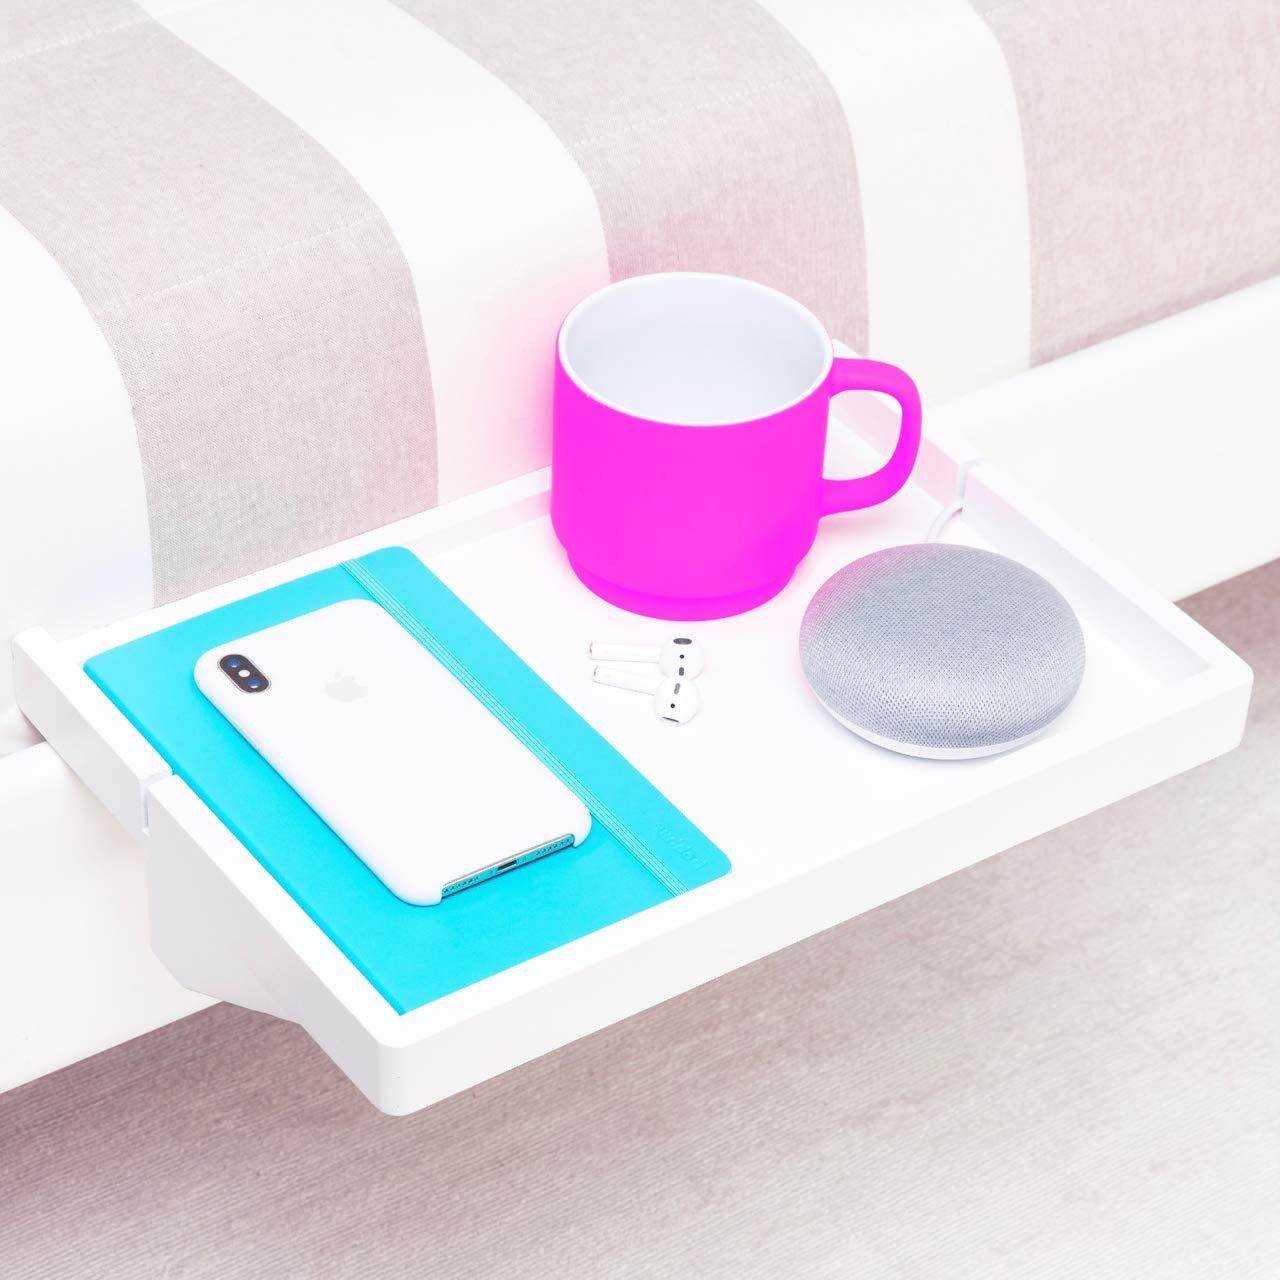 BedShelfie - 3 Colors | Premium Modern Bamboo Bedside Shelf | Space-Saving, Adjustable Floating Nightstand for Small Bedrooms, Loft Bunk Beds, Dorms | Minimalist Tray Table Organizer (in White) BedShelfie3